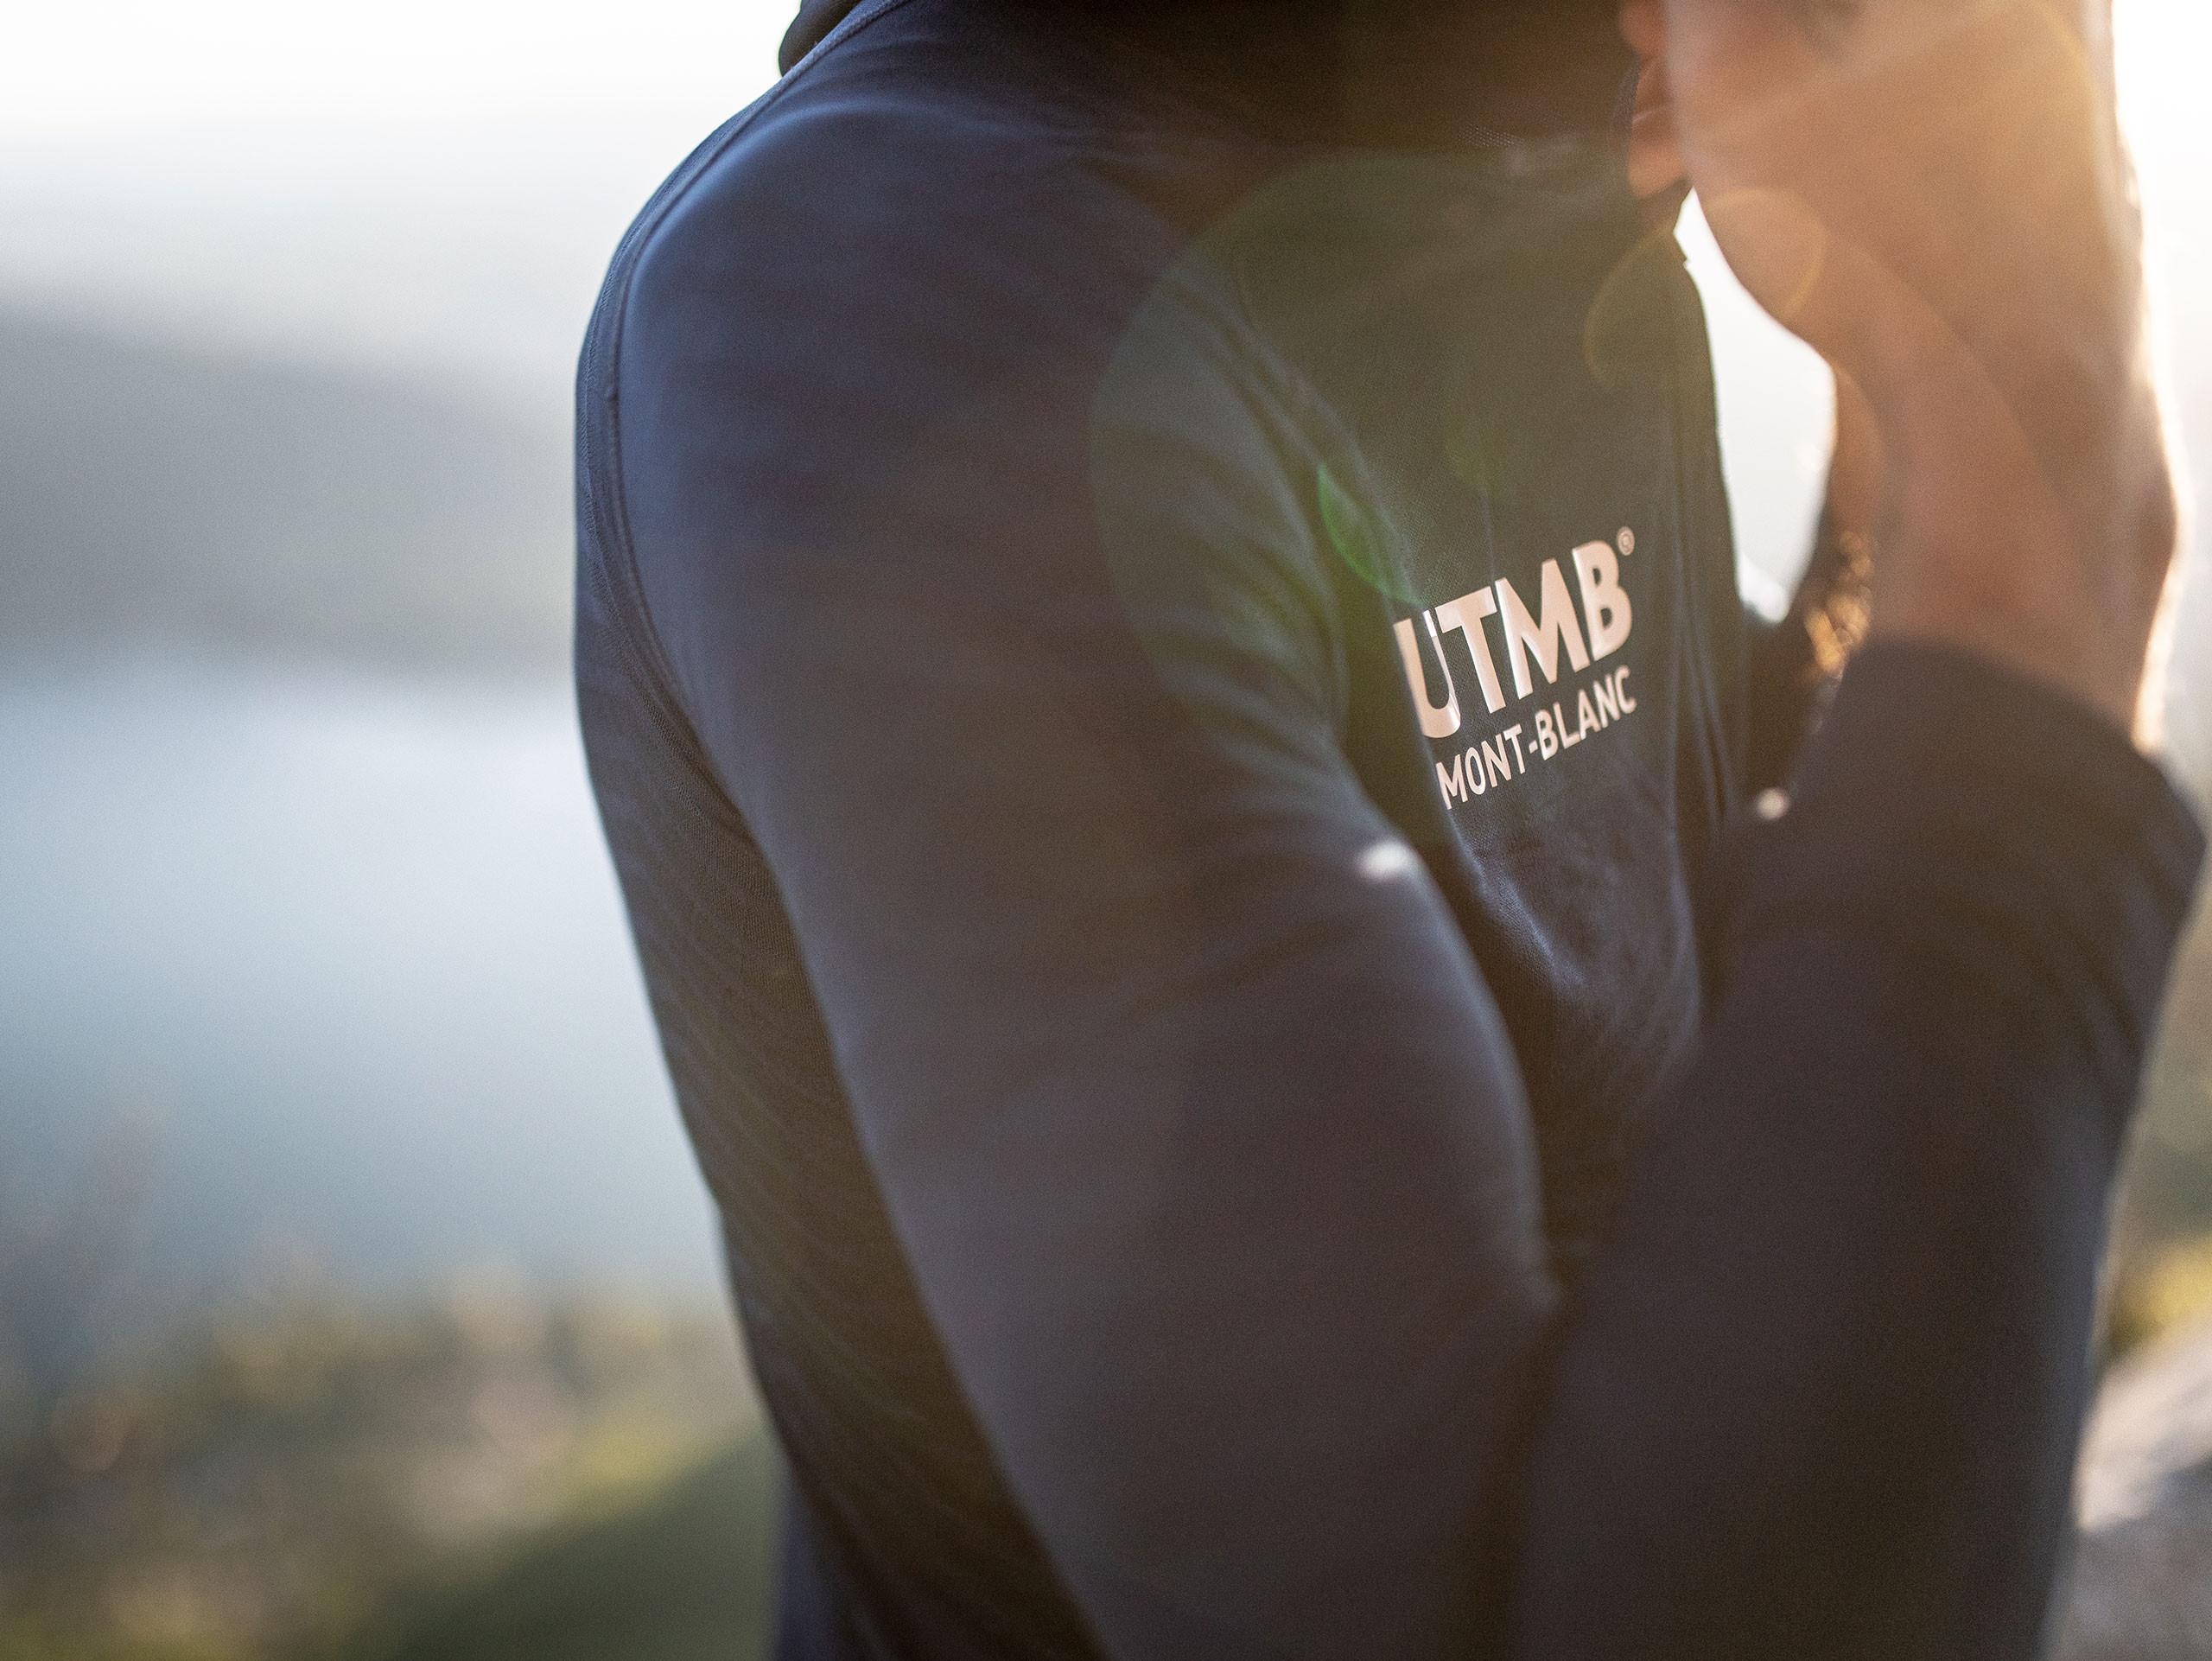 Ultra-Trail 180g Kapuzenpullover für den Renneinsatz - UTMB® 2019